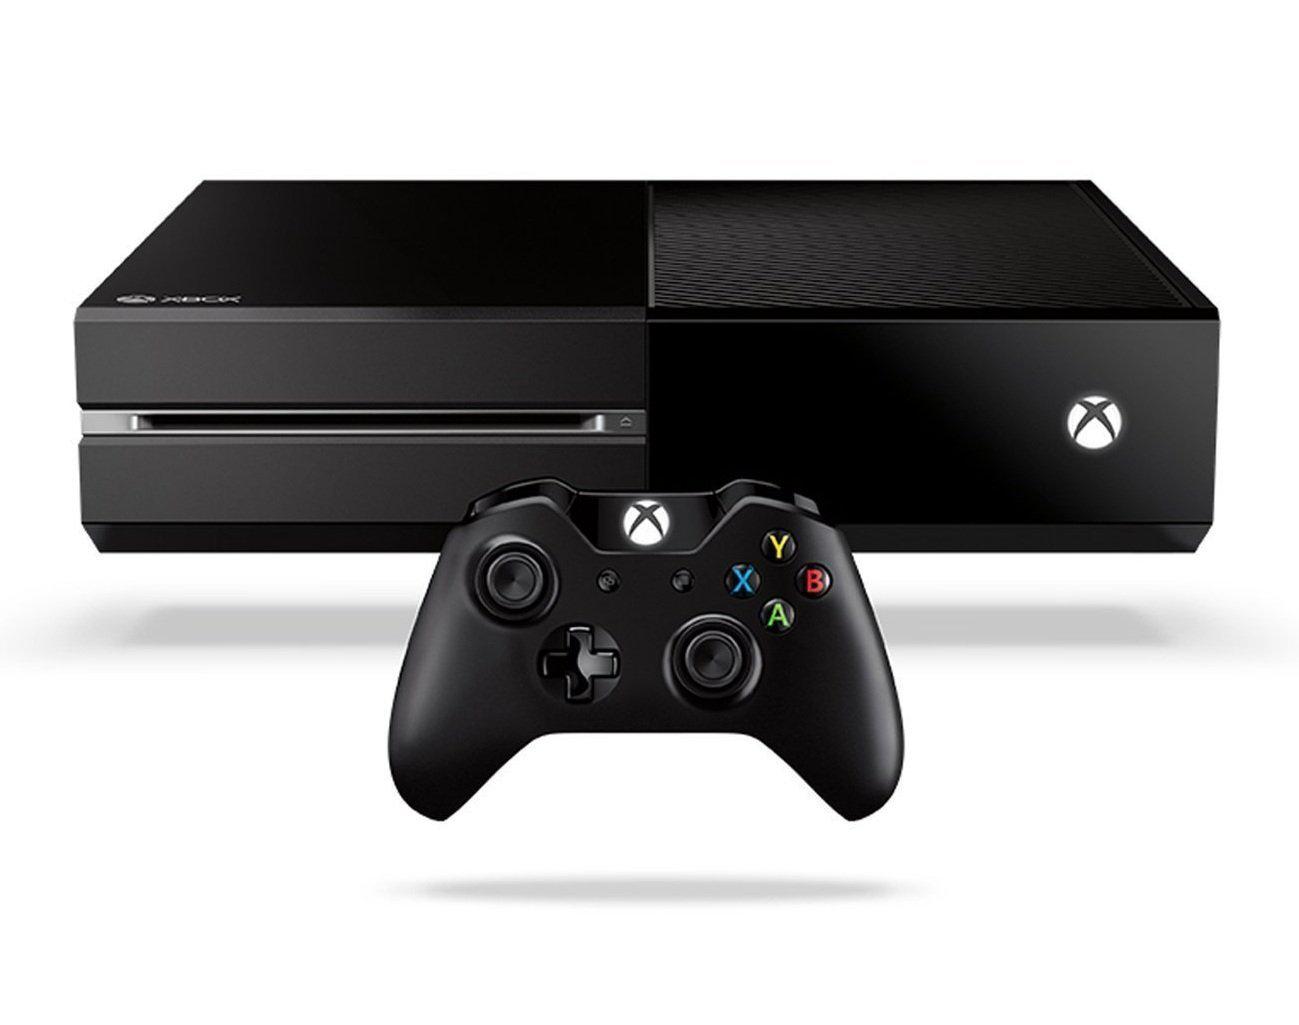 Console Xbox One + un jeu au choix (Far Cry 4, Destiny, Call Of Duty, etc...)